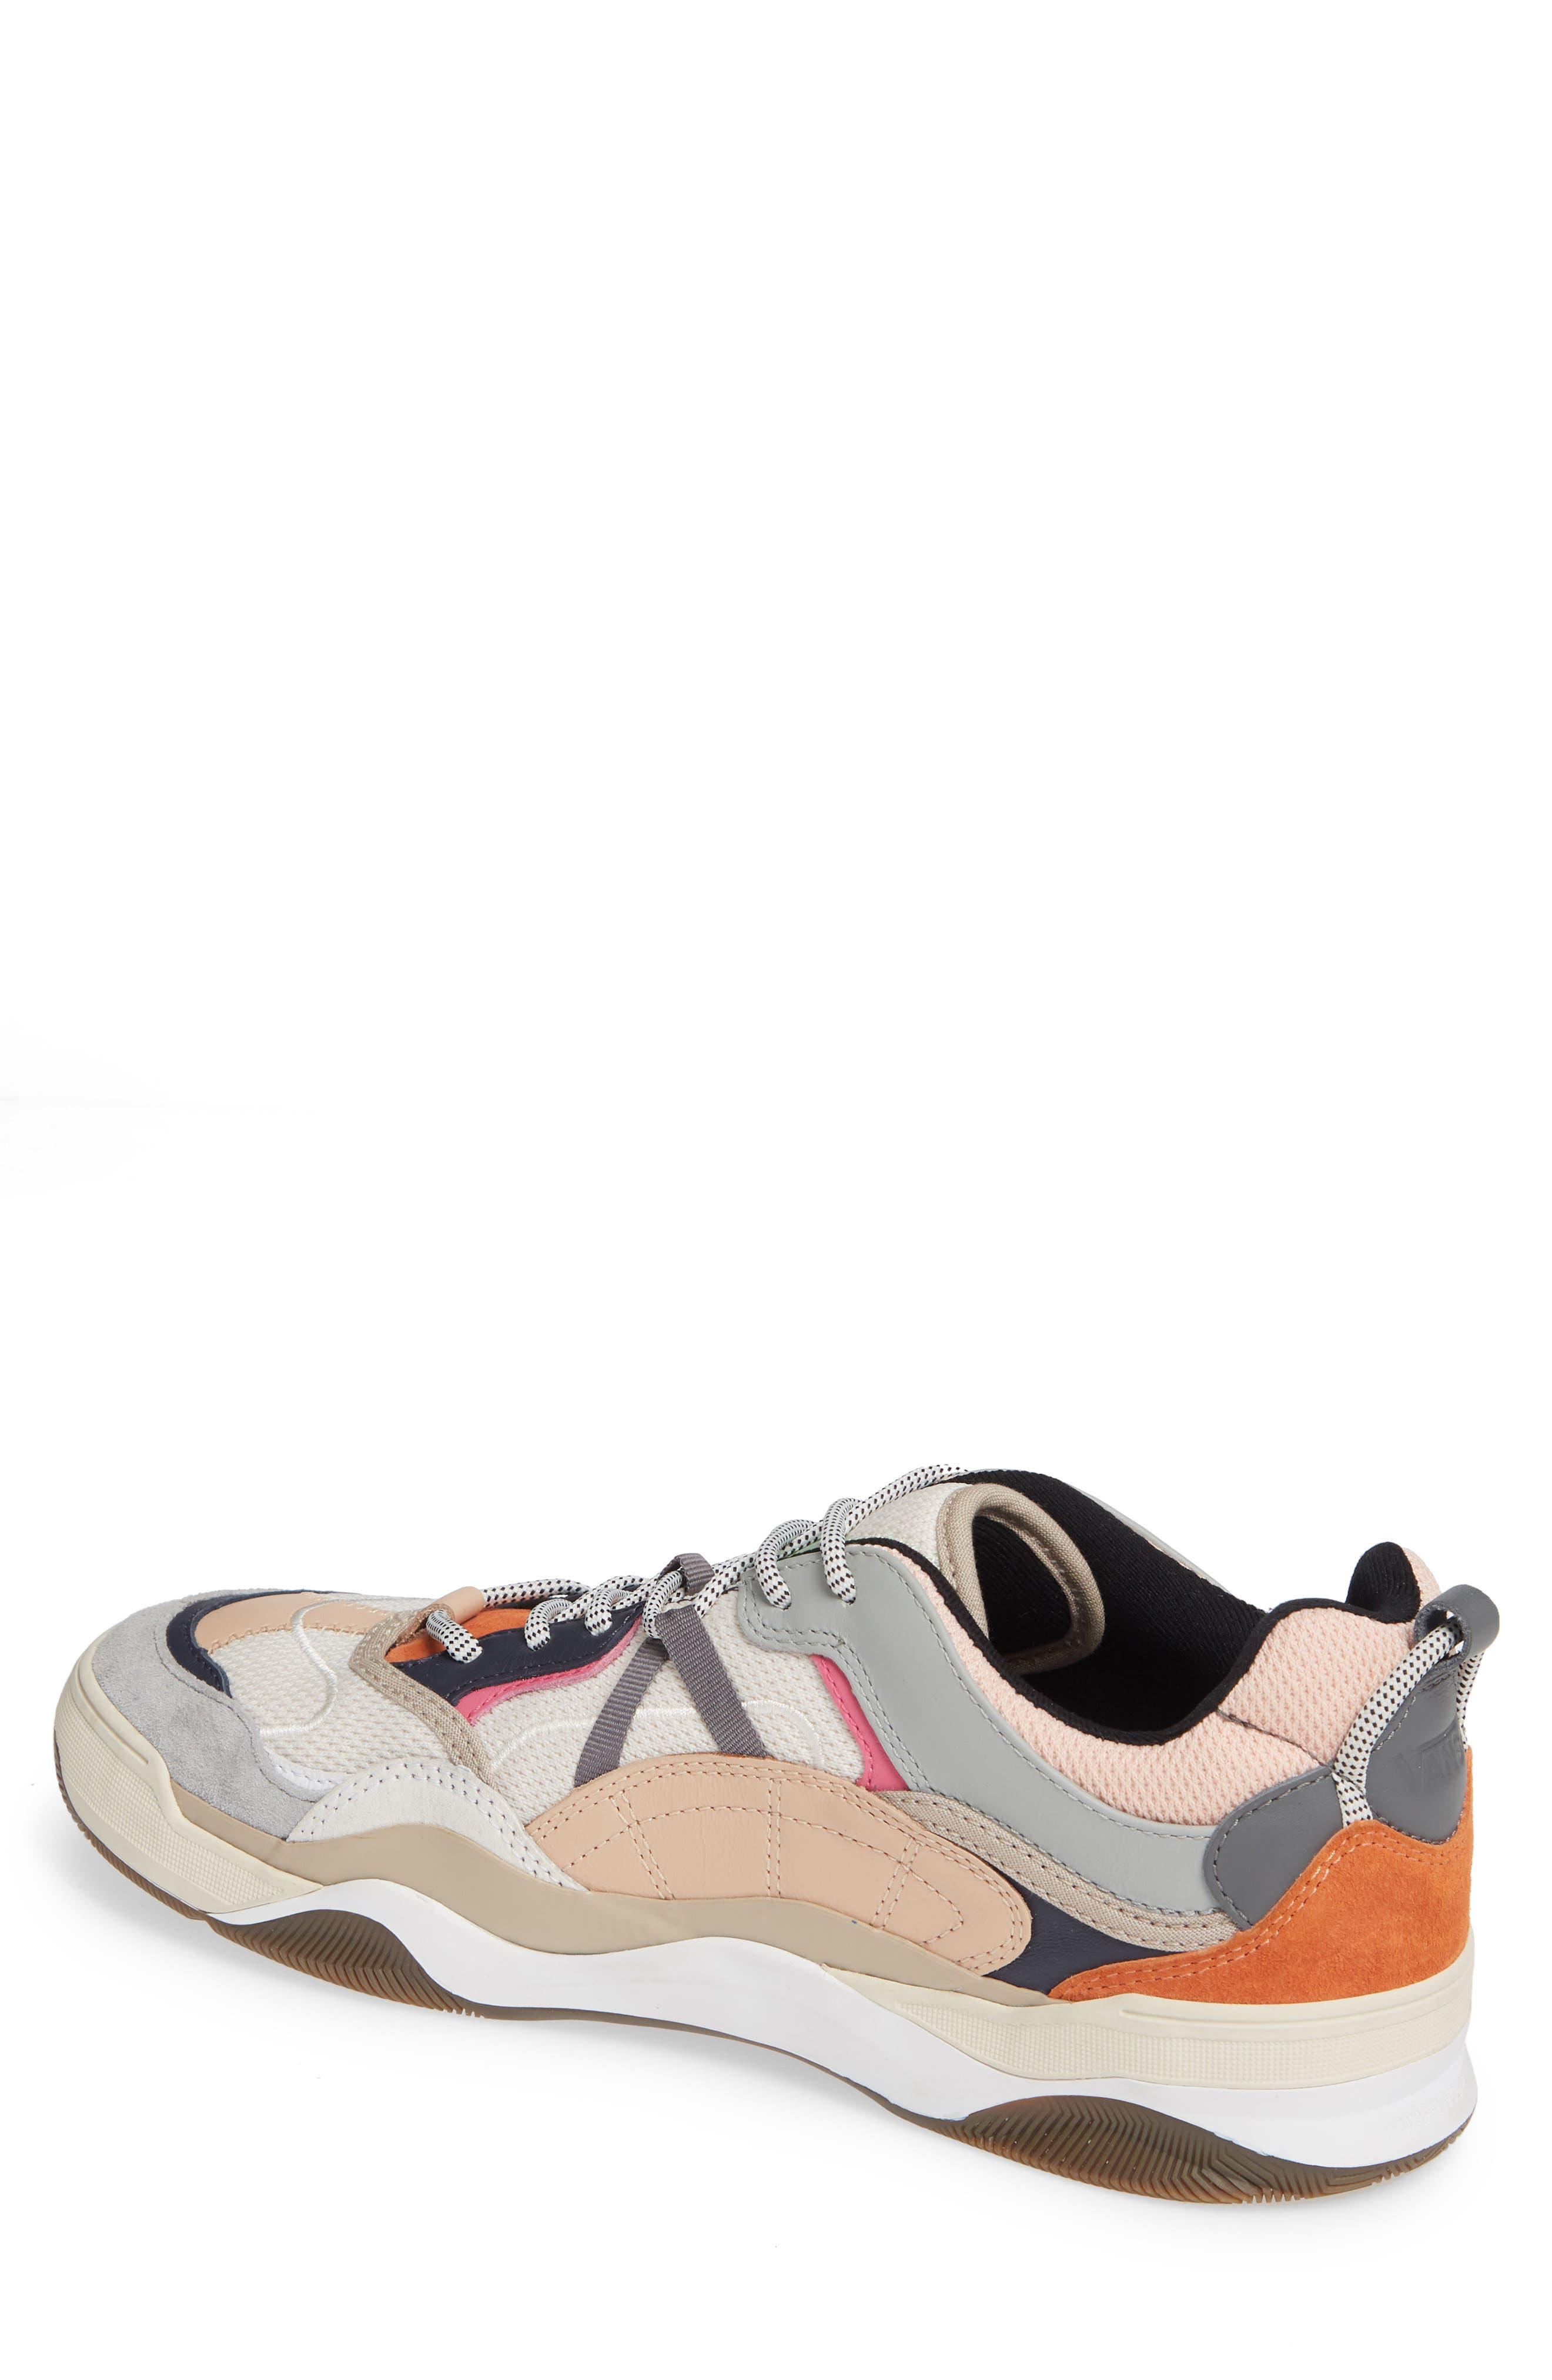 VANS,                             Varix WC Sneaker,                             Alternate thumbnail 2, color,                             TURTLEDOVE/ TRUE WHITE LEATHER